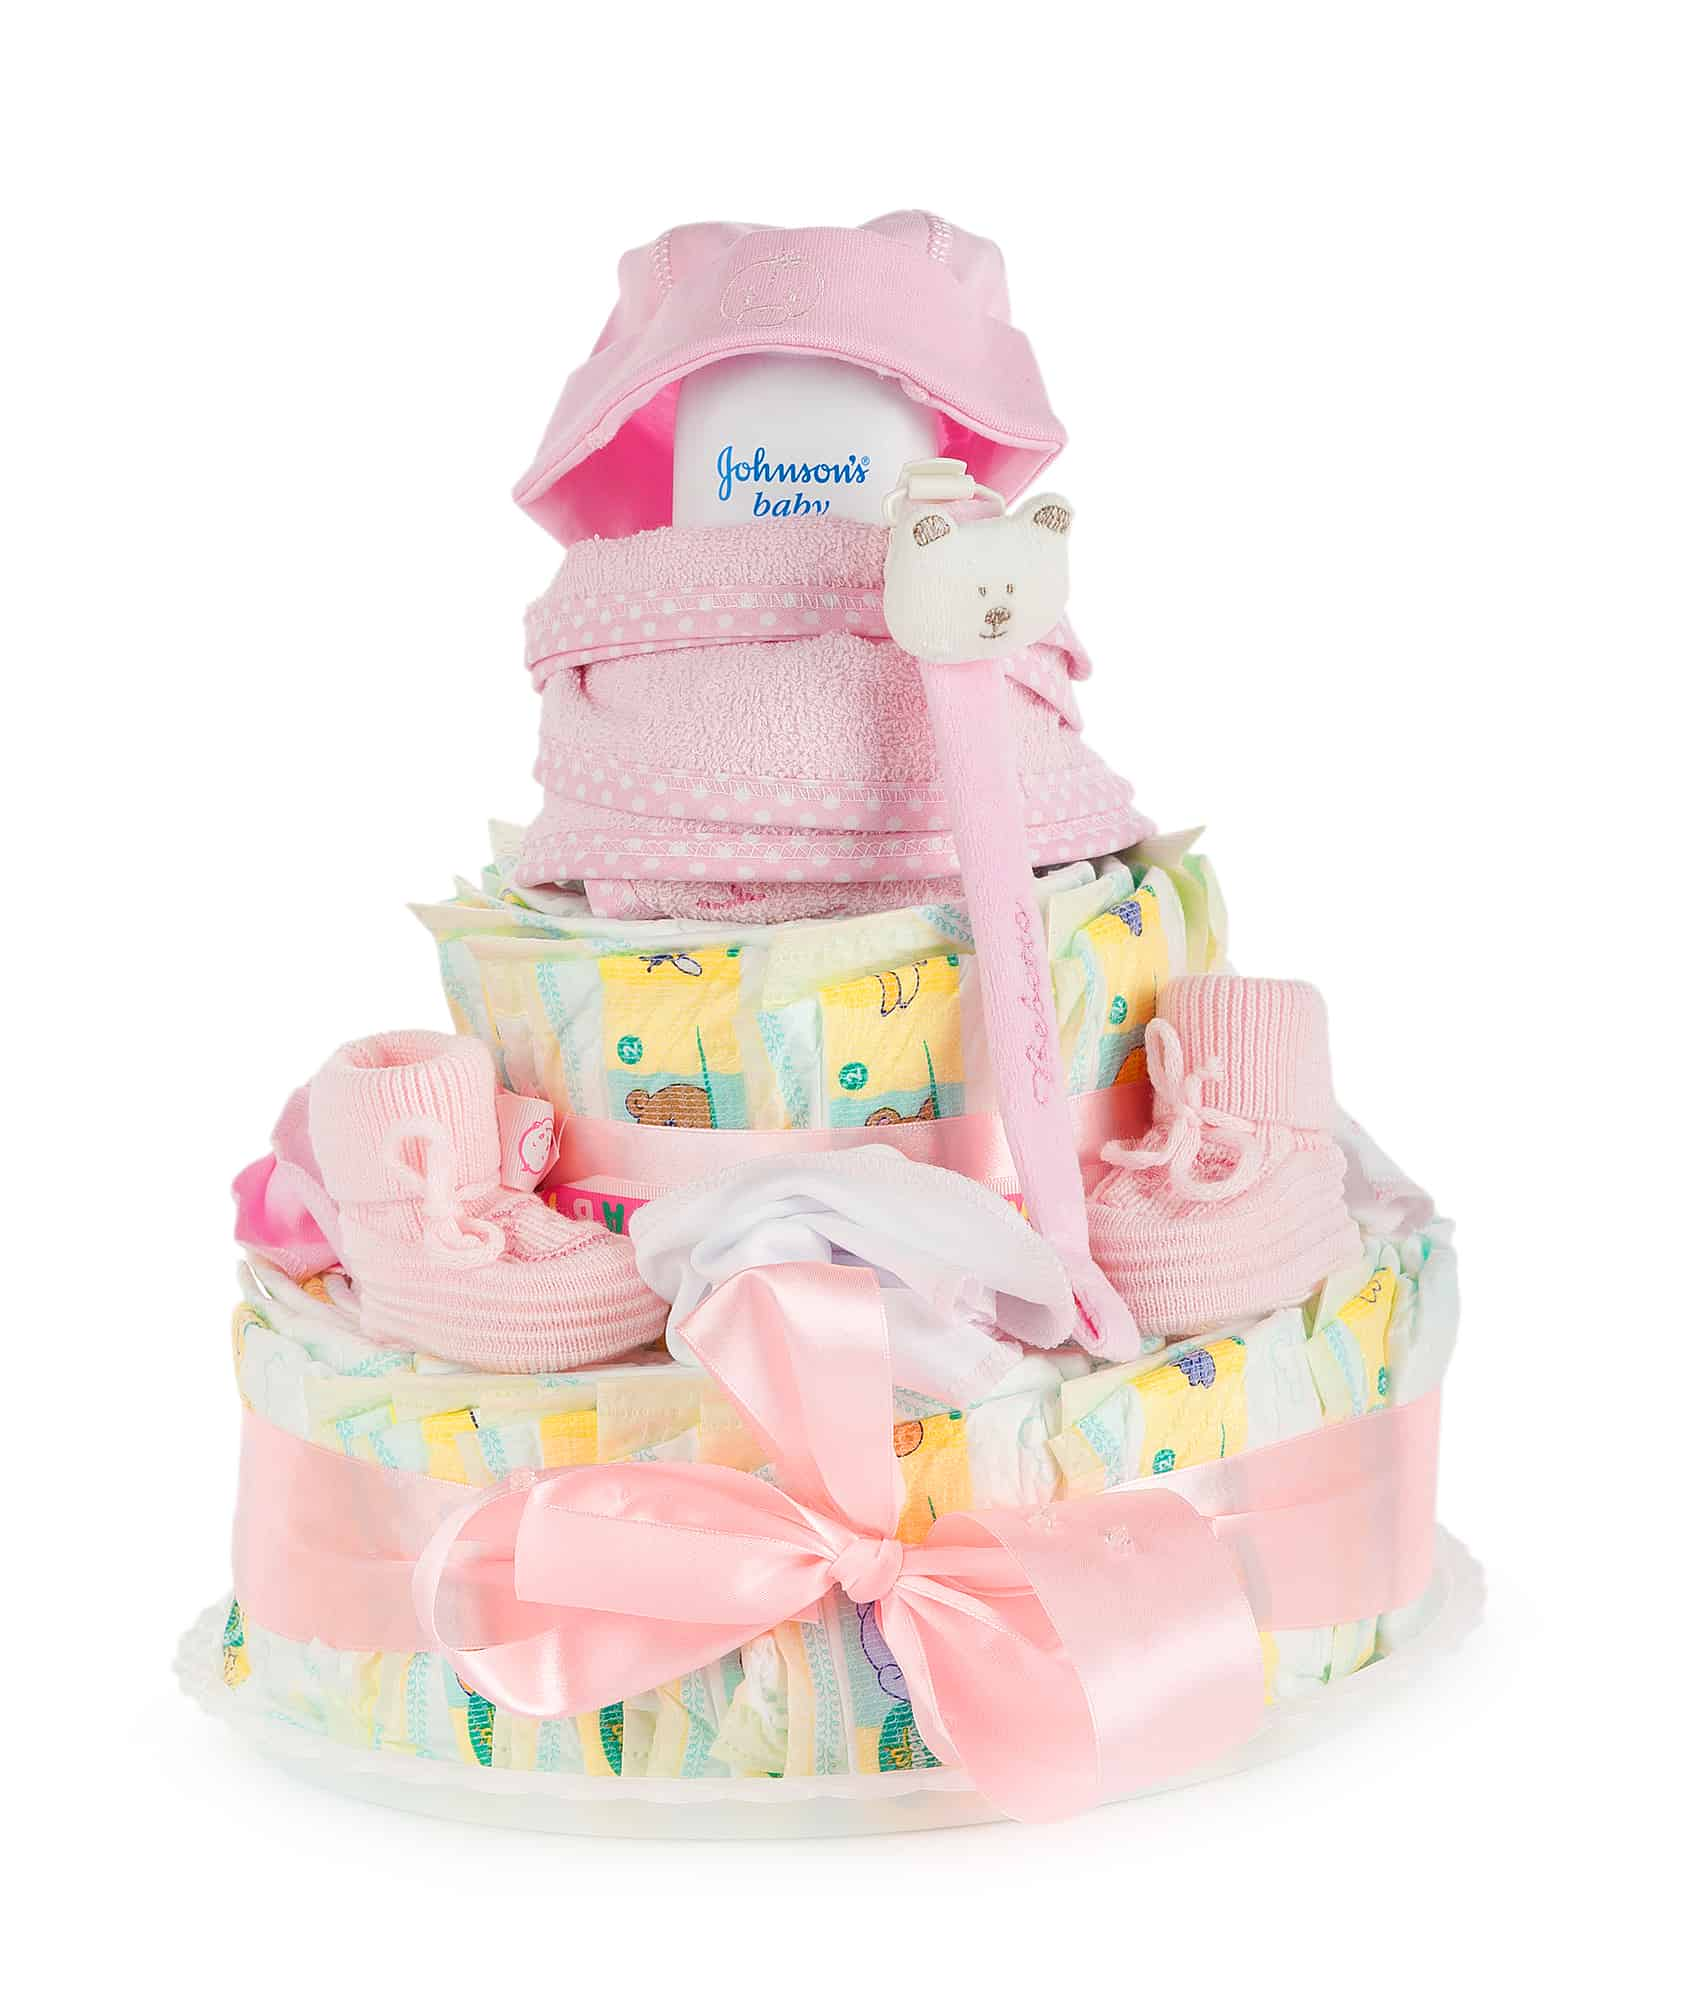 Baby Shower ideas. Diaper Cake